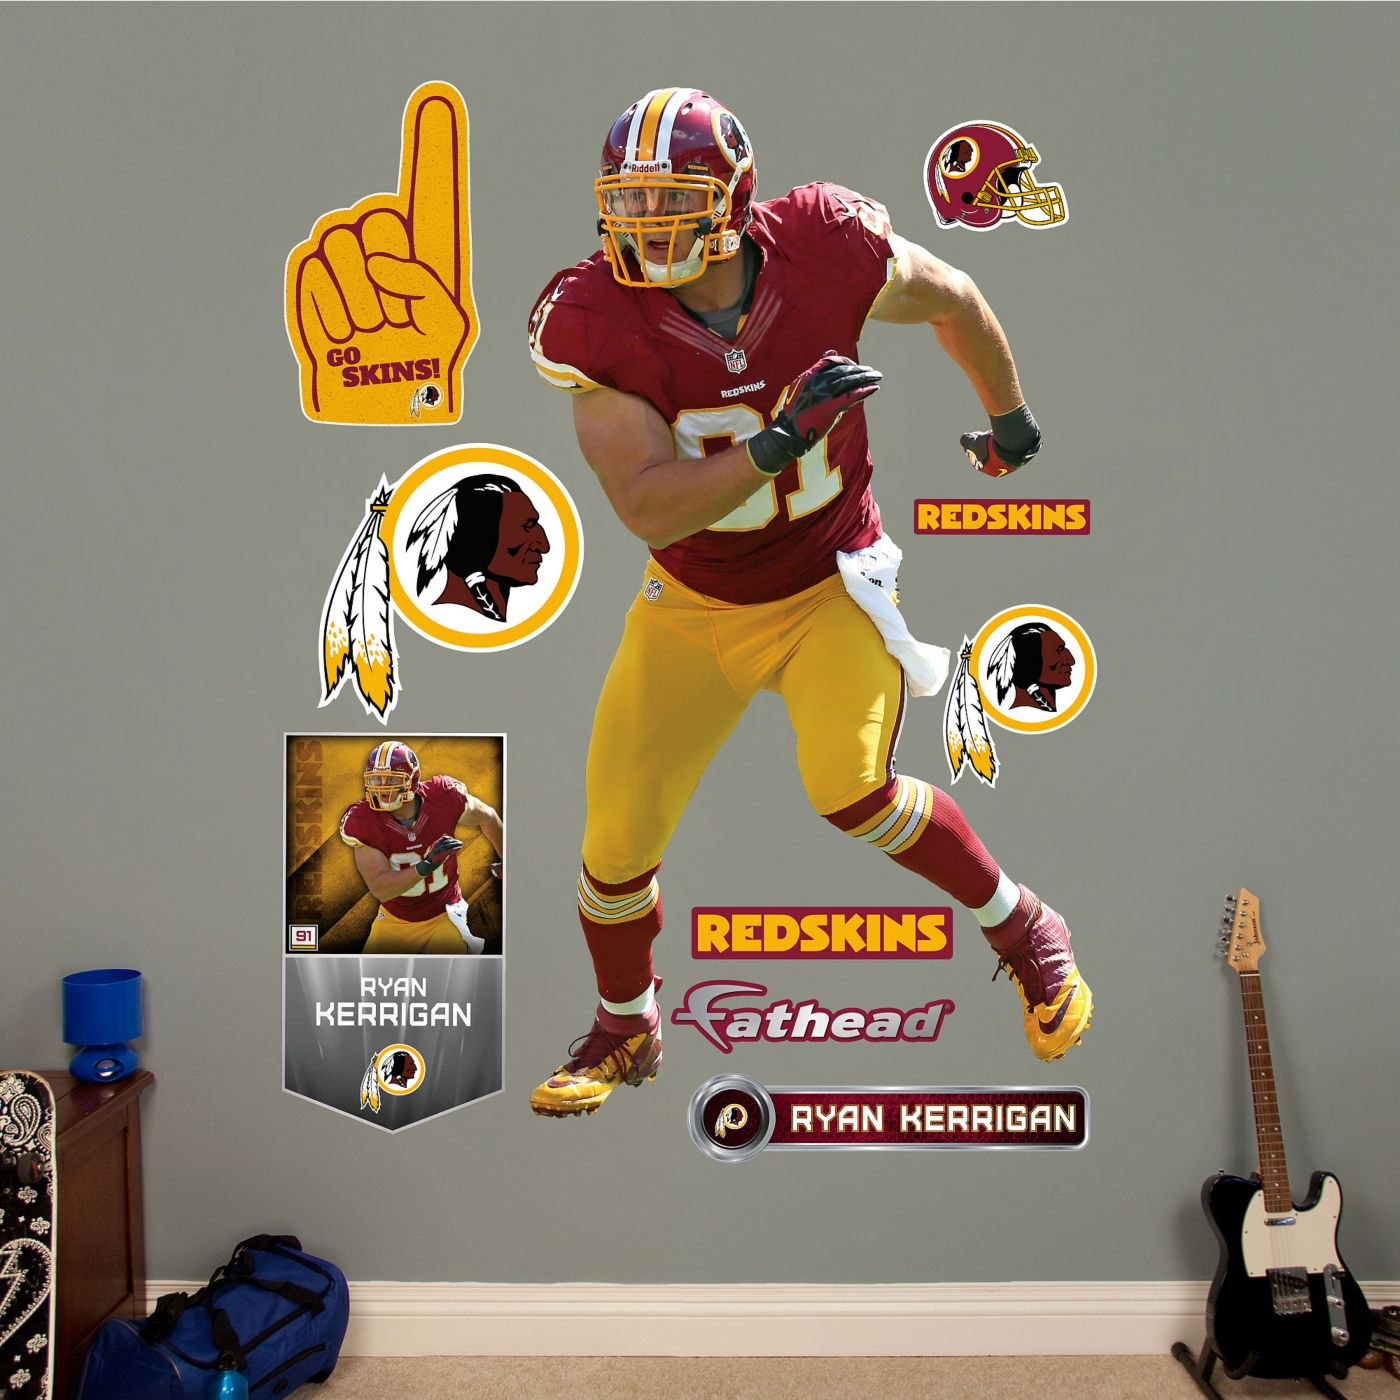 Fathead Ryan Kerrigan #91 Washington Redskins Real Big Wall Graphic